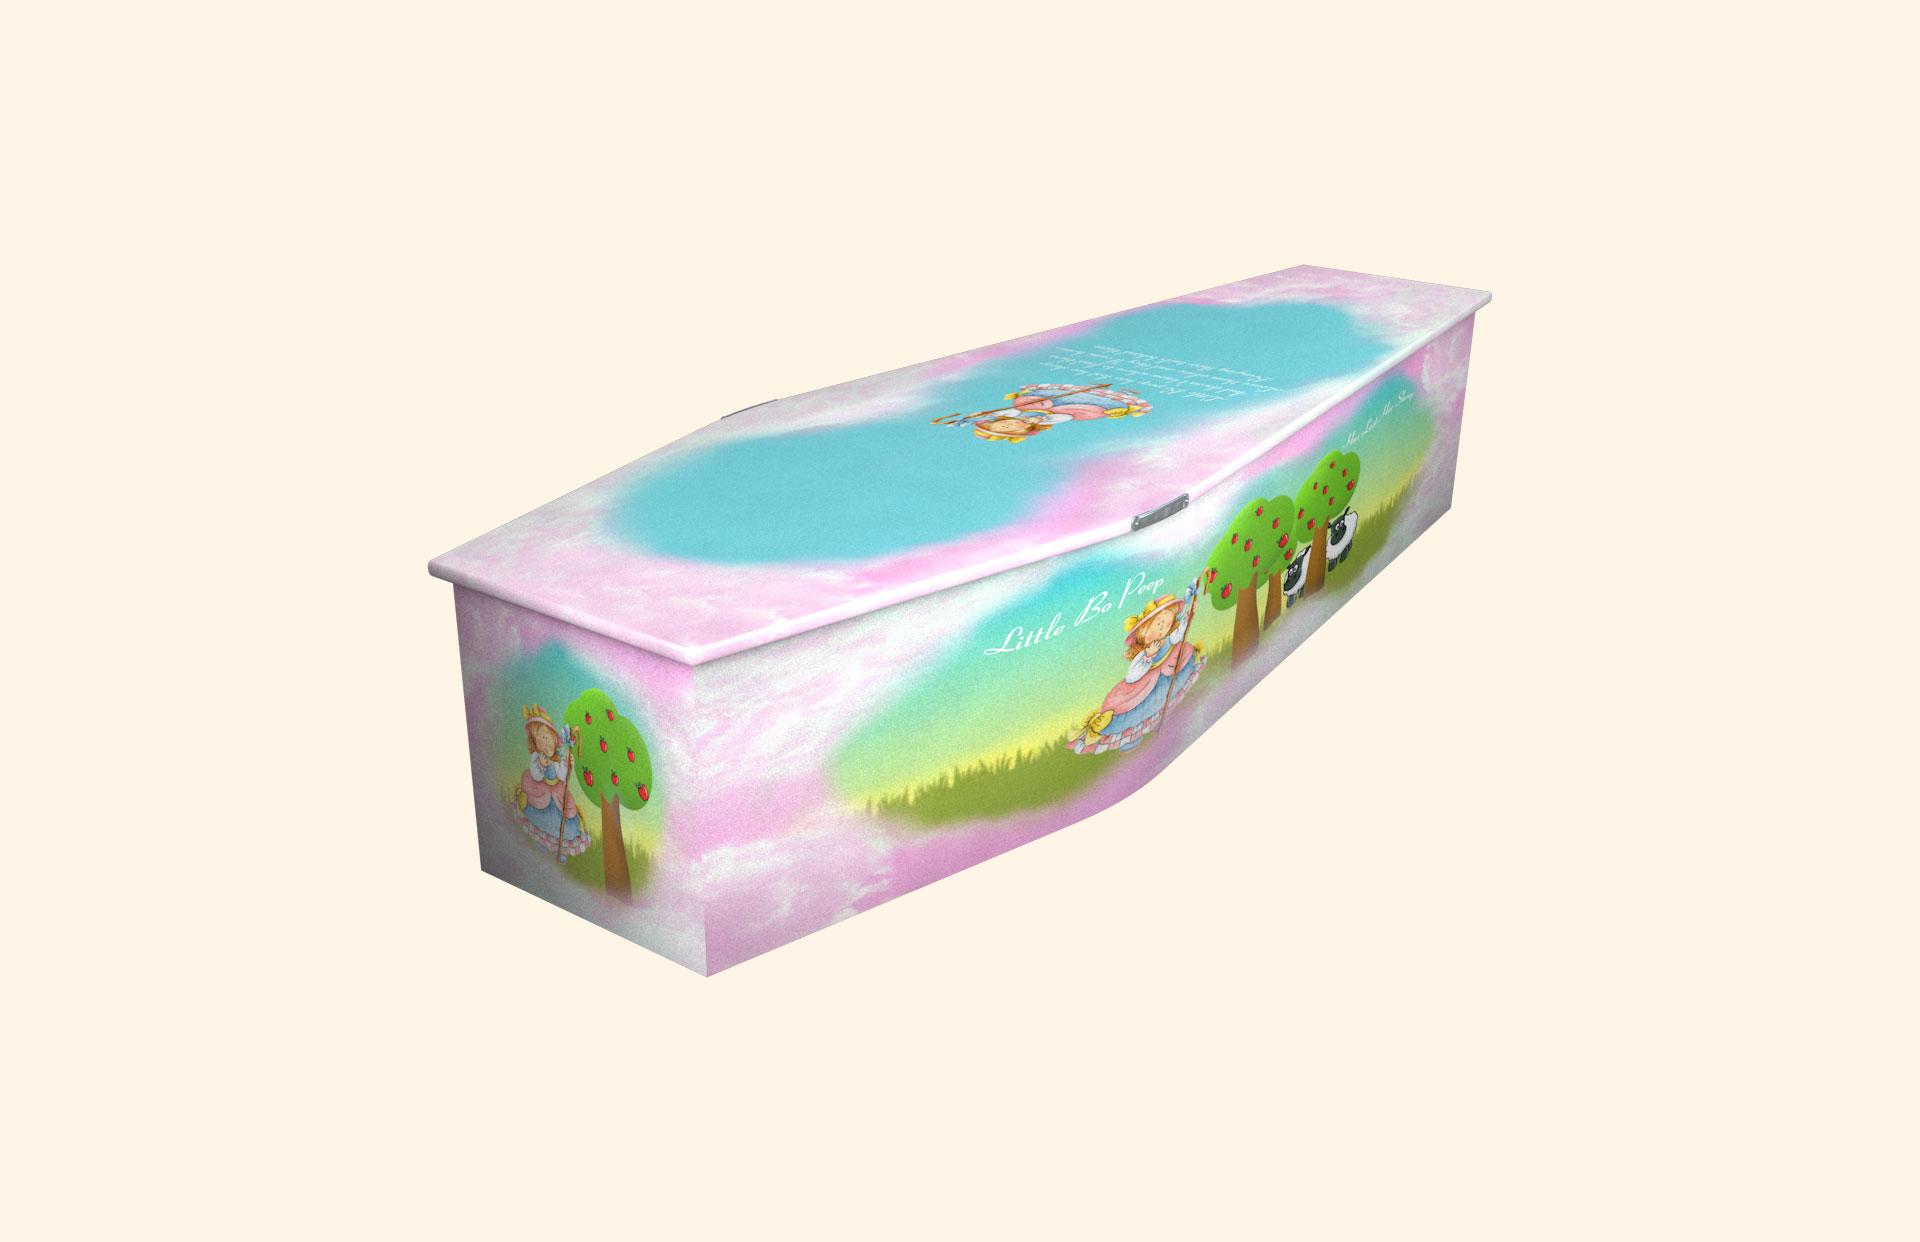 Little Bo Peep child coffin